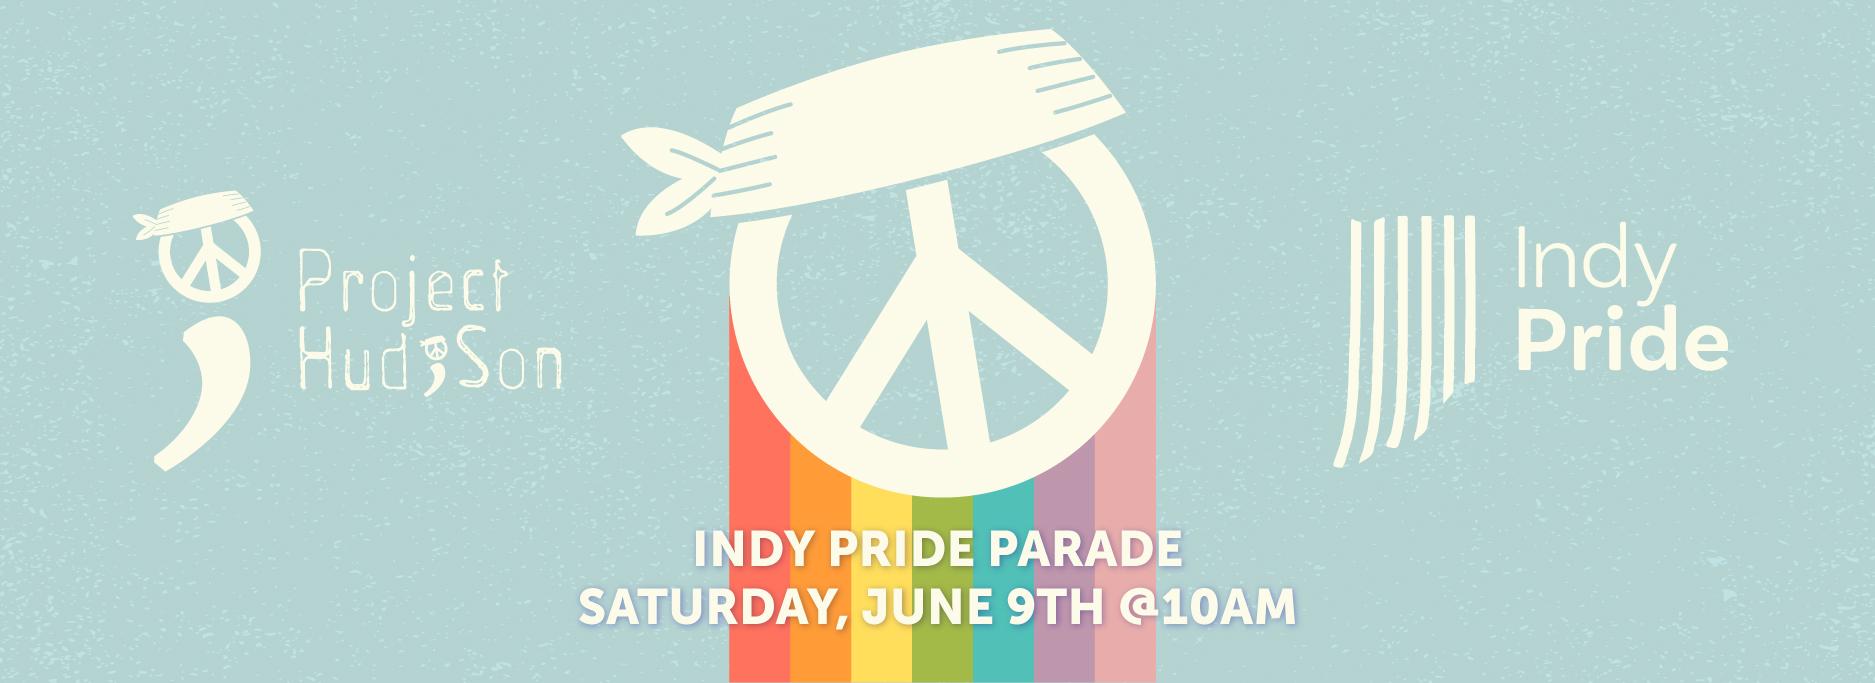 2018 rainbow logo2_parade event banner 2 copy.jpg